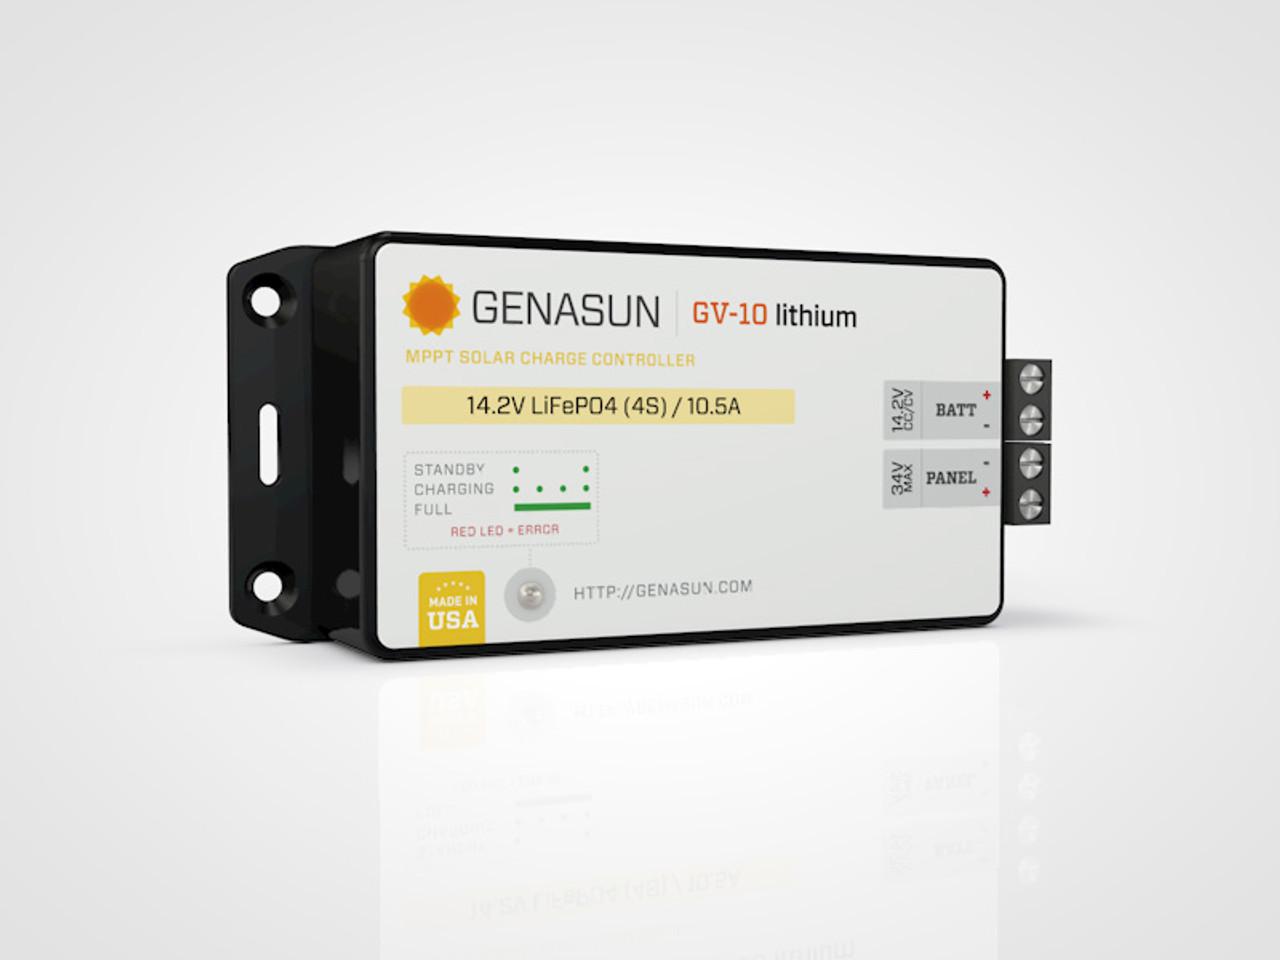 GV-10 | 140W 10A 14.6V Genasun MPPT Solar Charge Controller - Li - Left1